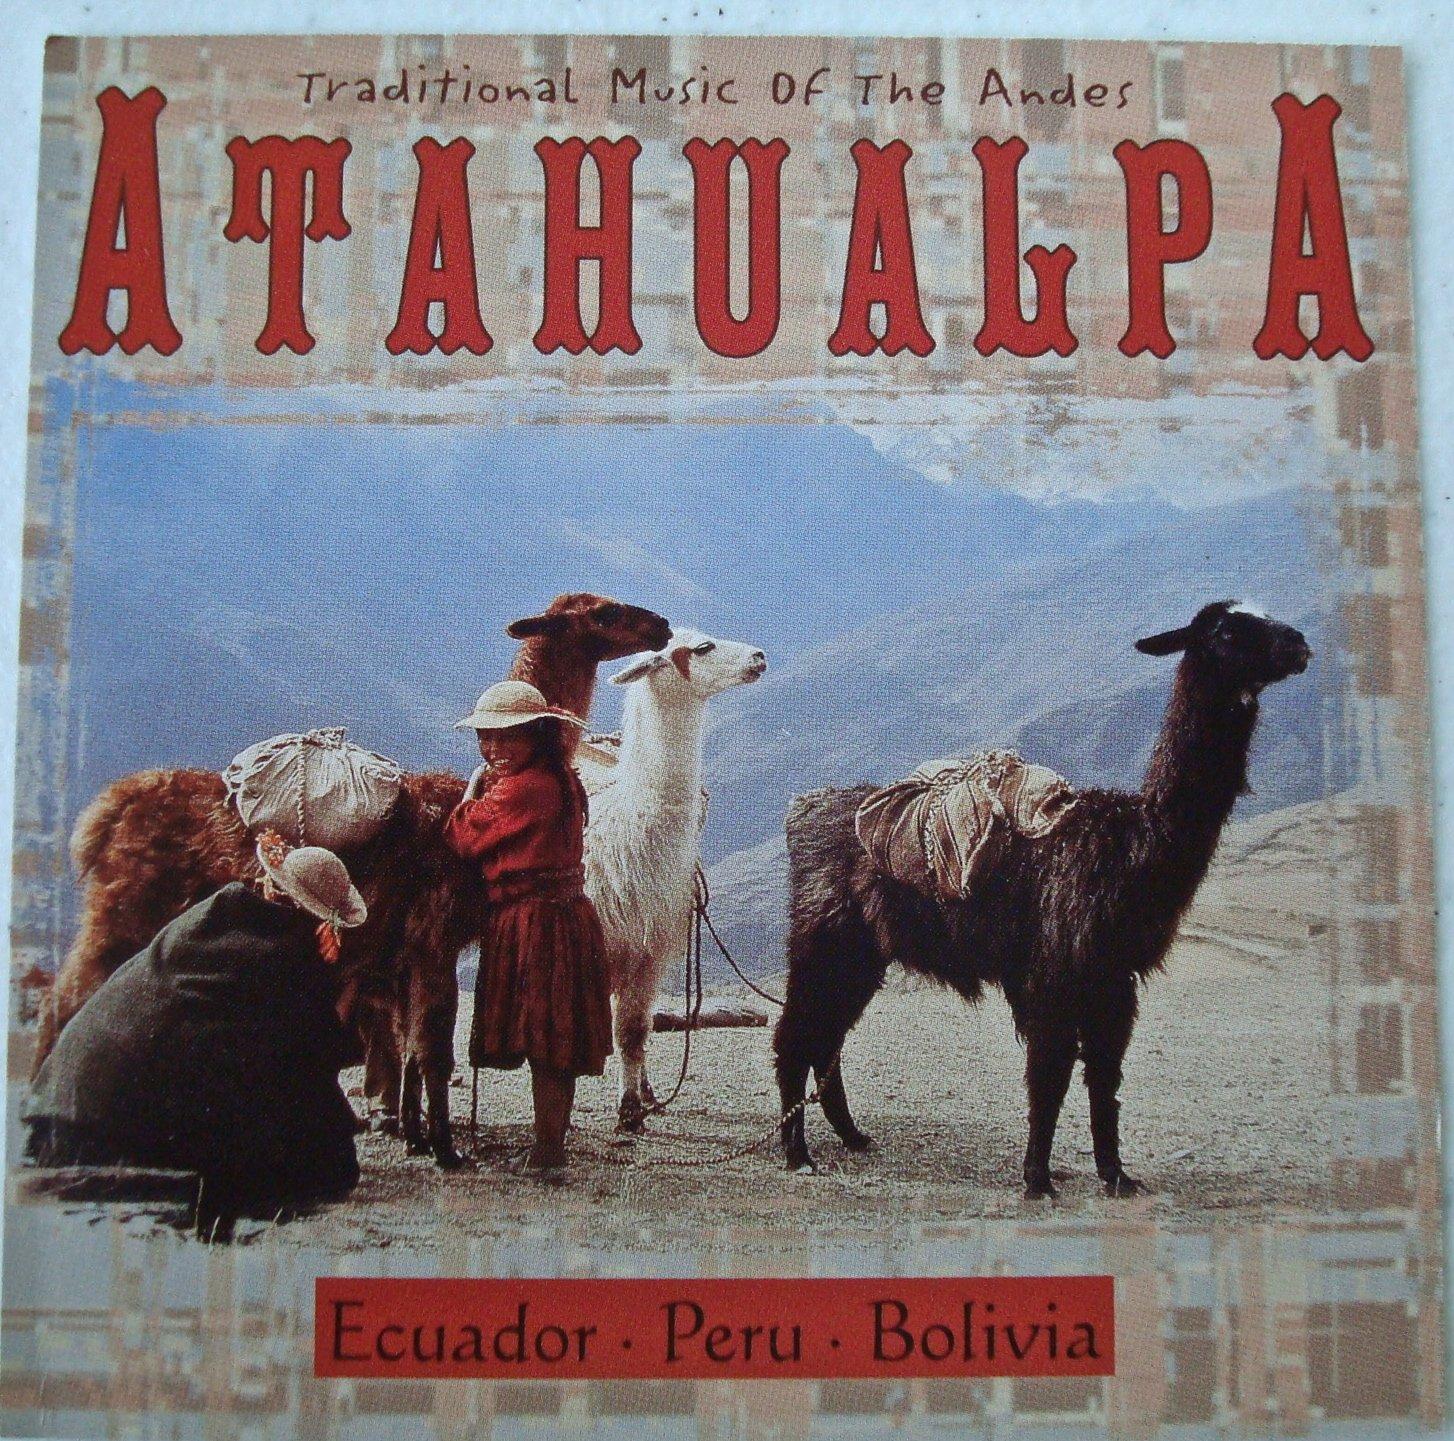 Atahualpa: Traditional Music of the Andes, Ecuador-Peru-Bolivia by Atahualpa